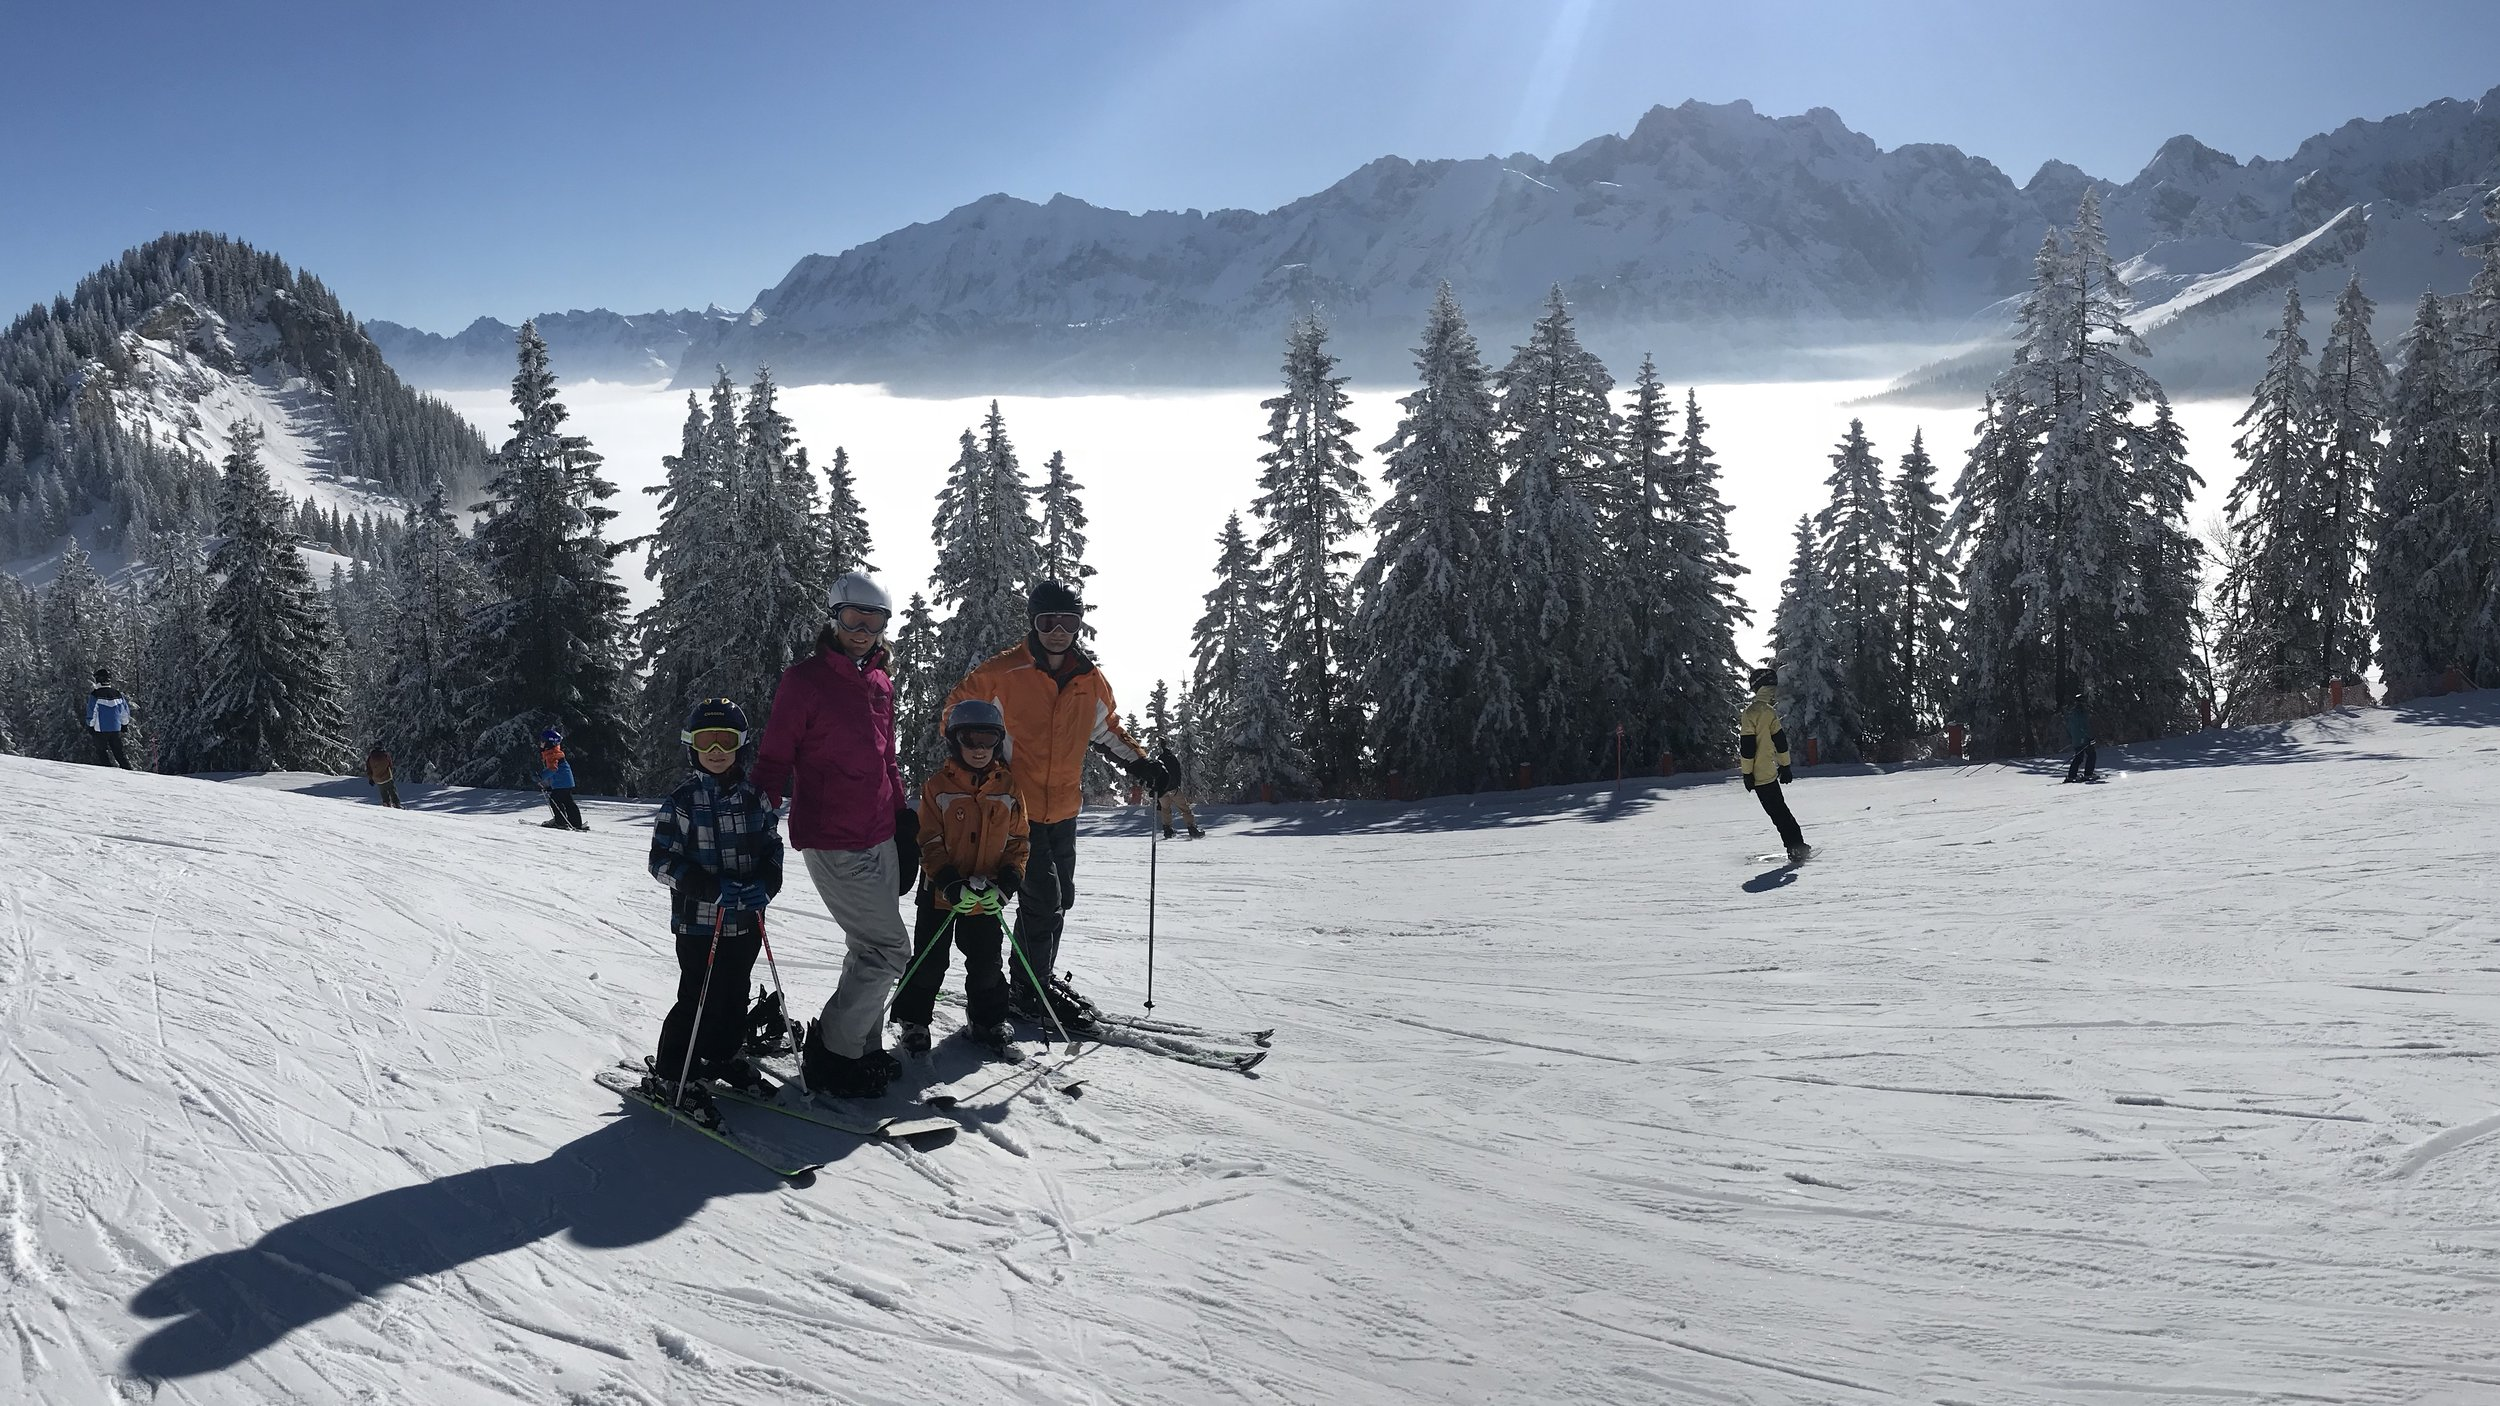 Bild 2 - Skitag